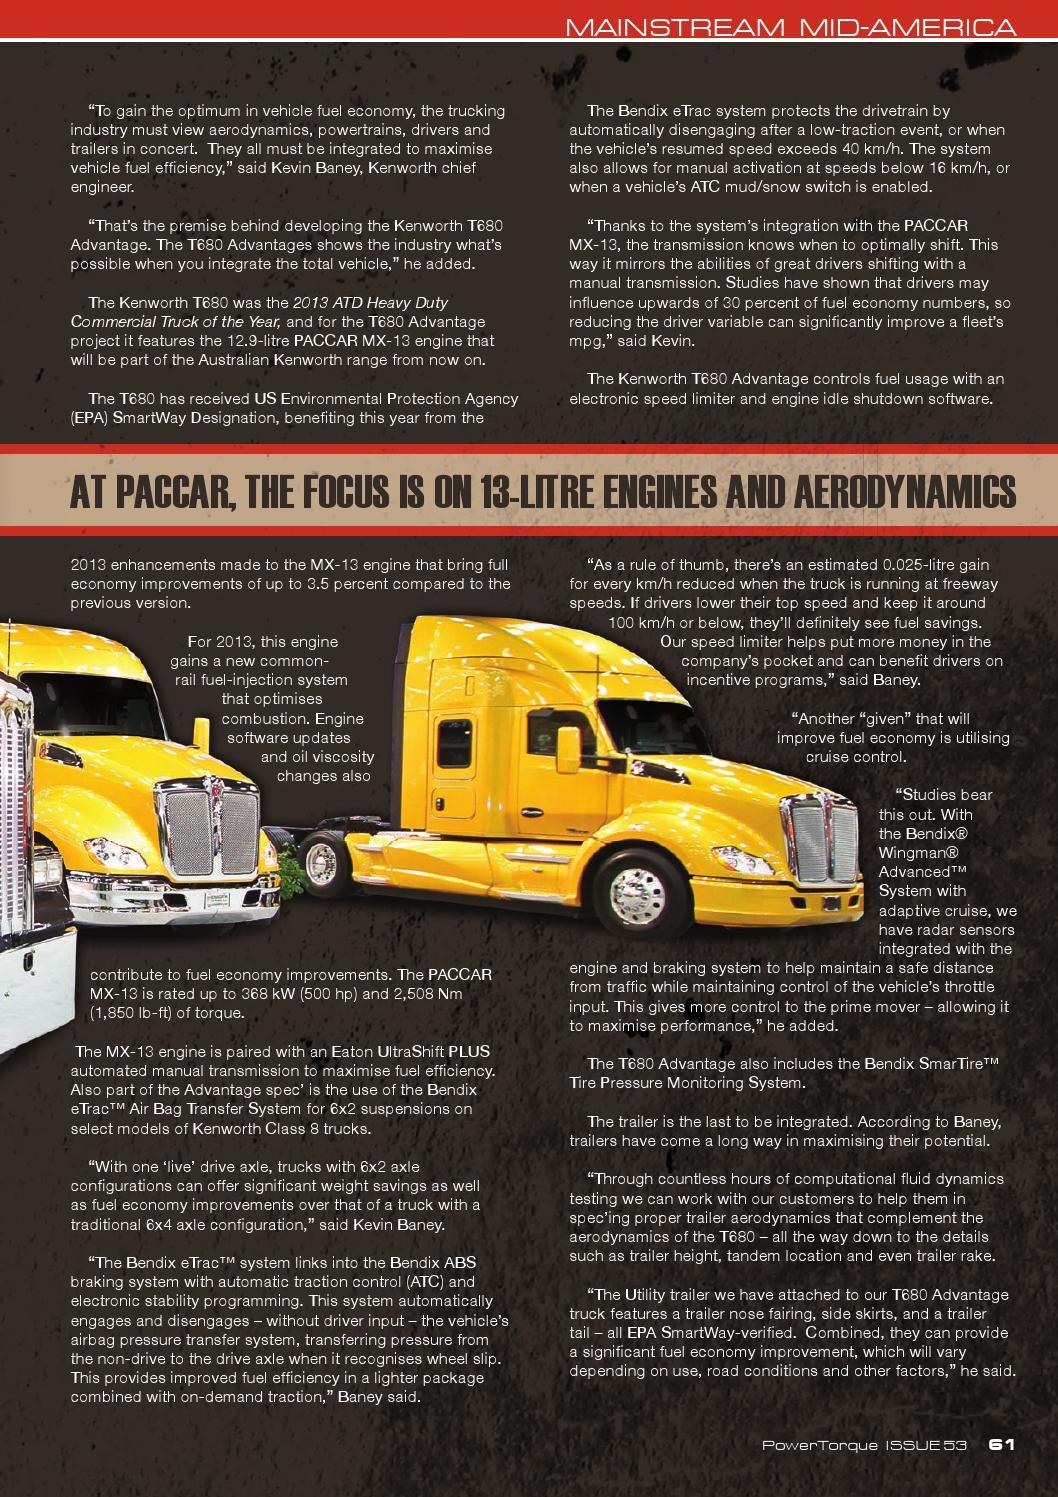 PowerTorque Magazine Issue 53 by Motoring Matters Magazine